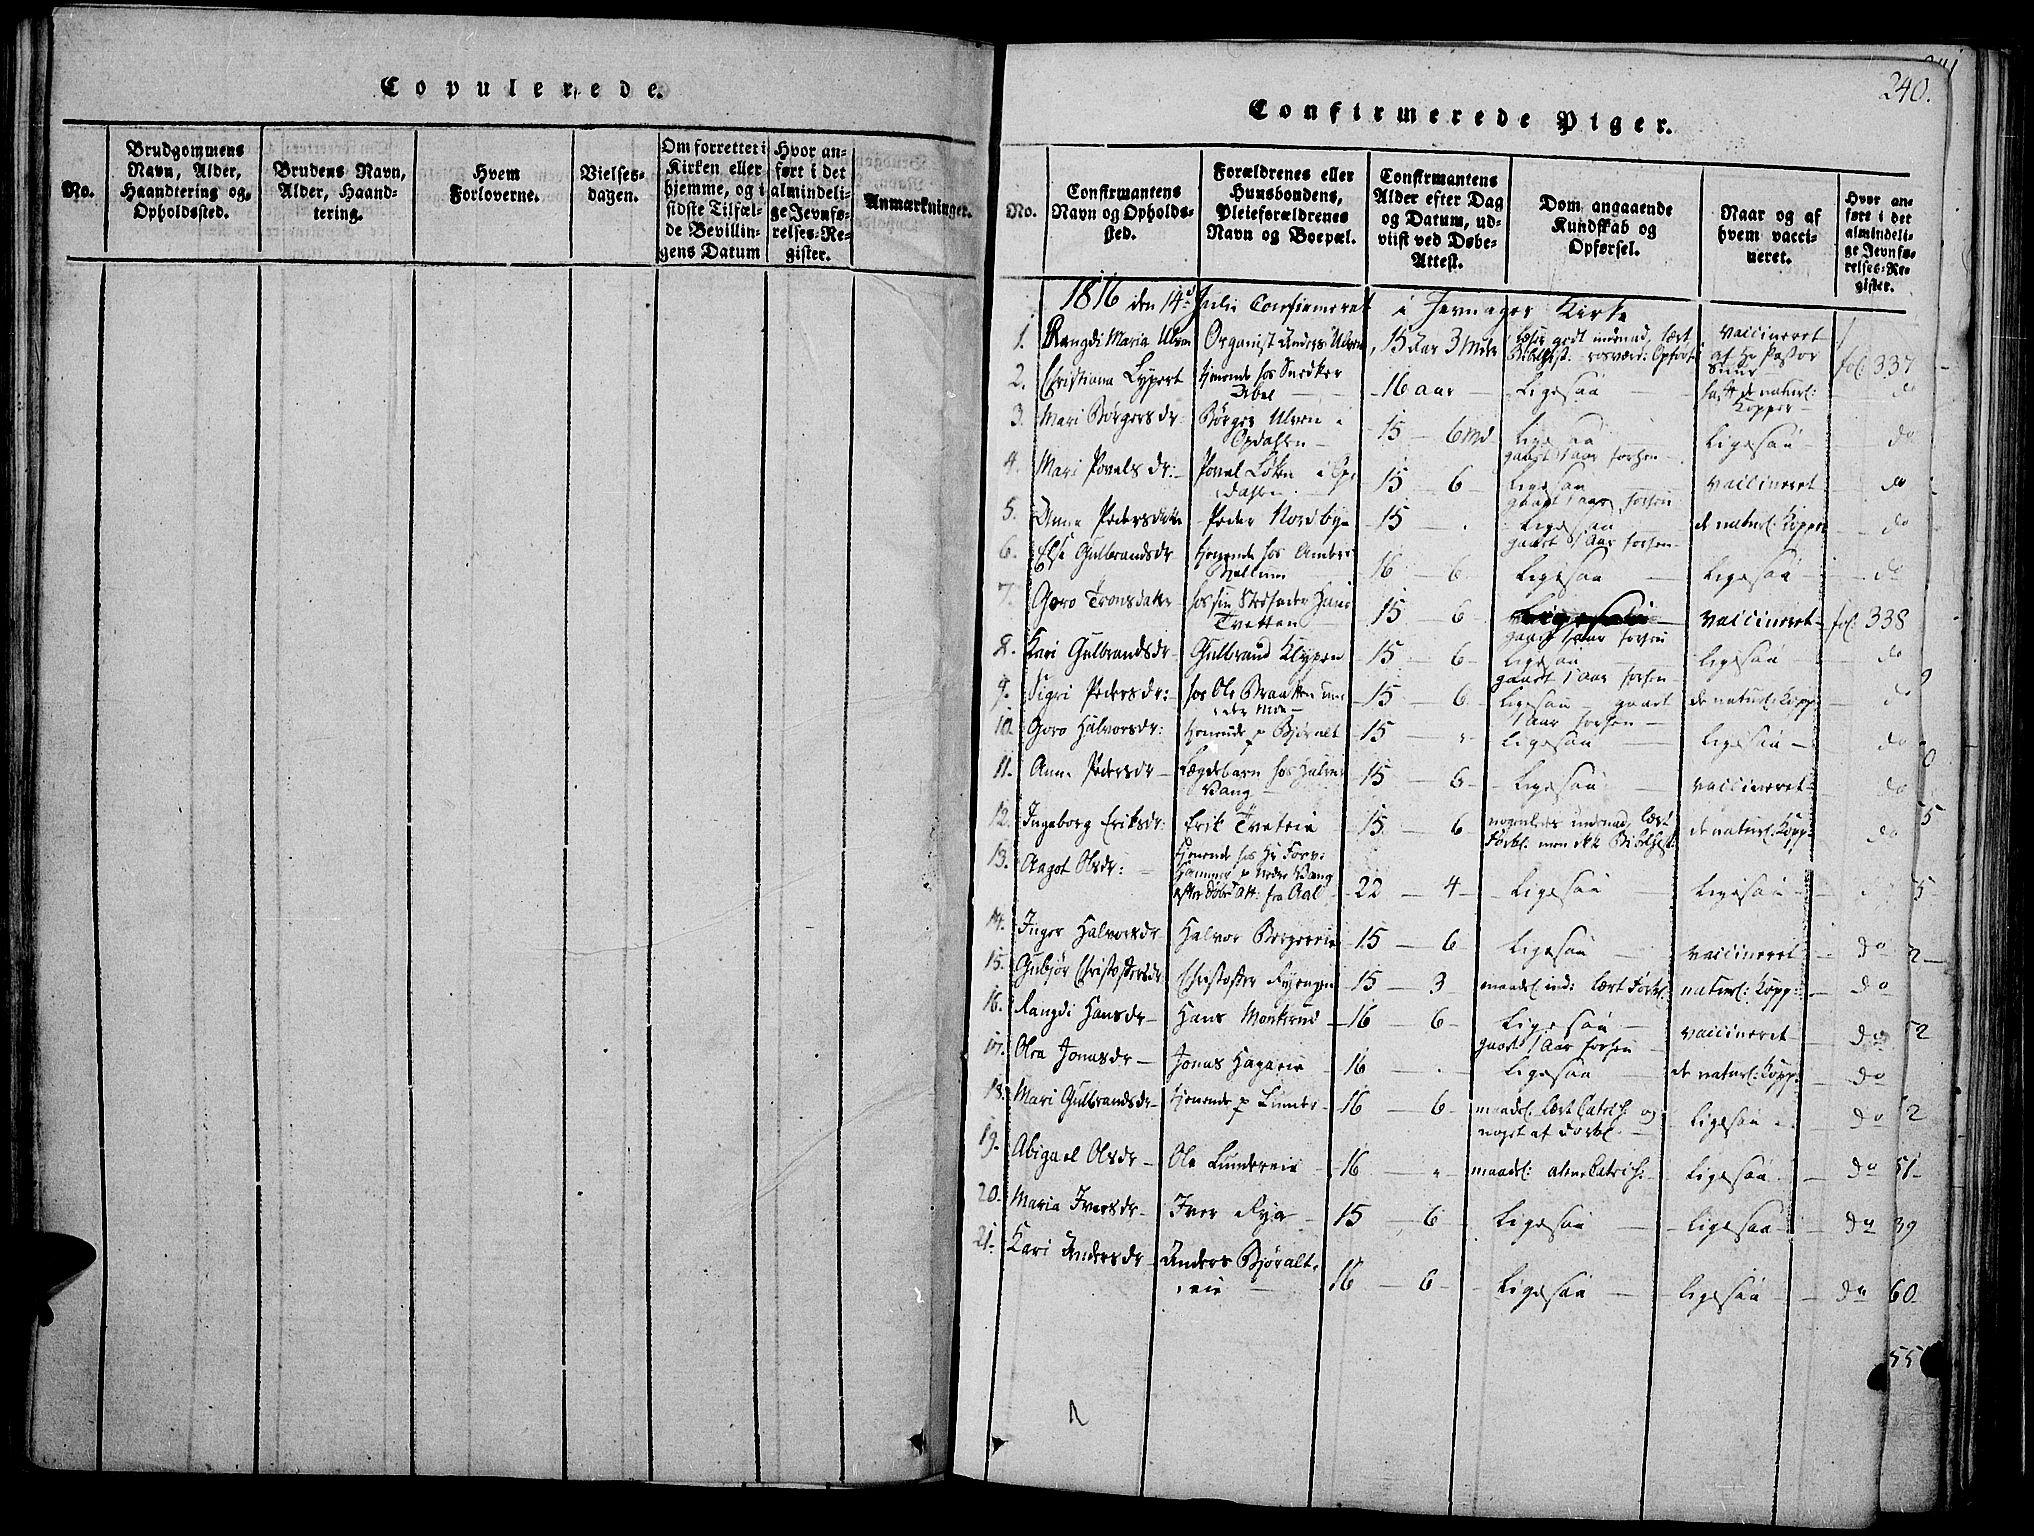 SAH, Jevnaker prestekontor, Ministerialbok nr. 5, 1815-1837, s. 240